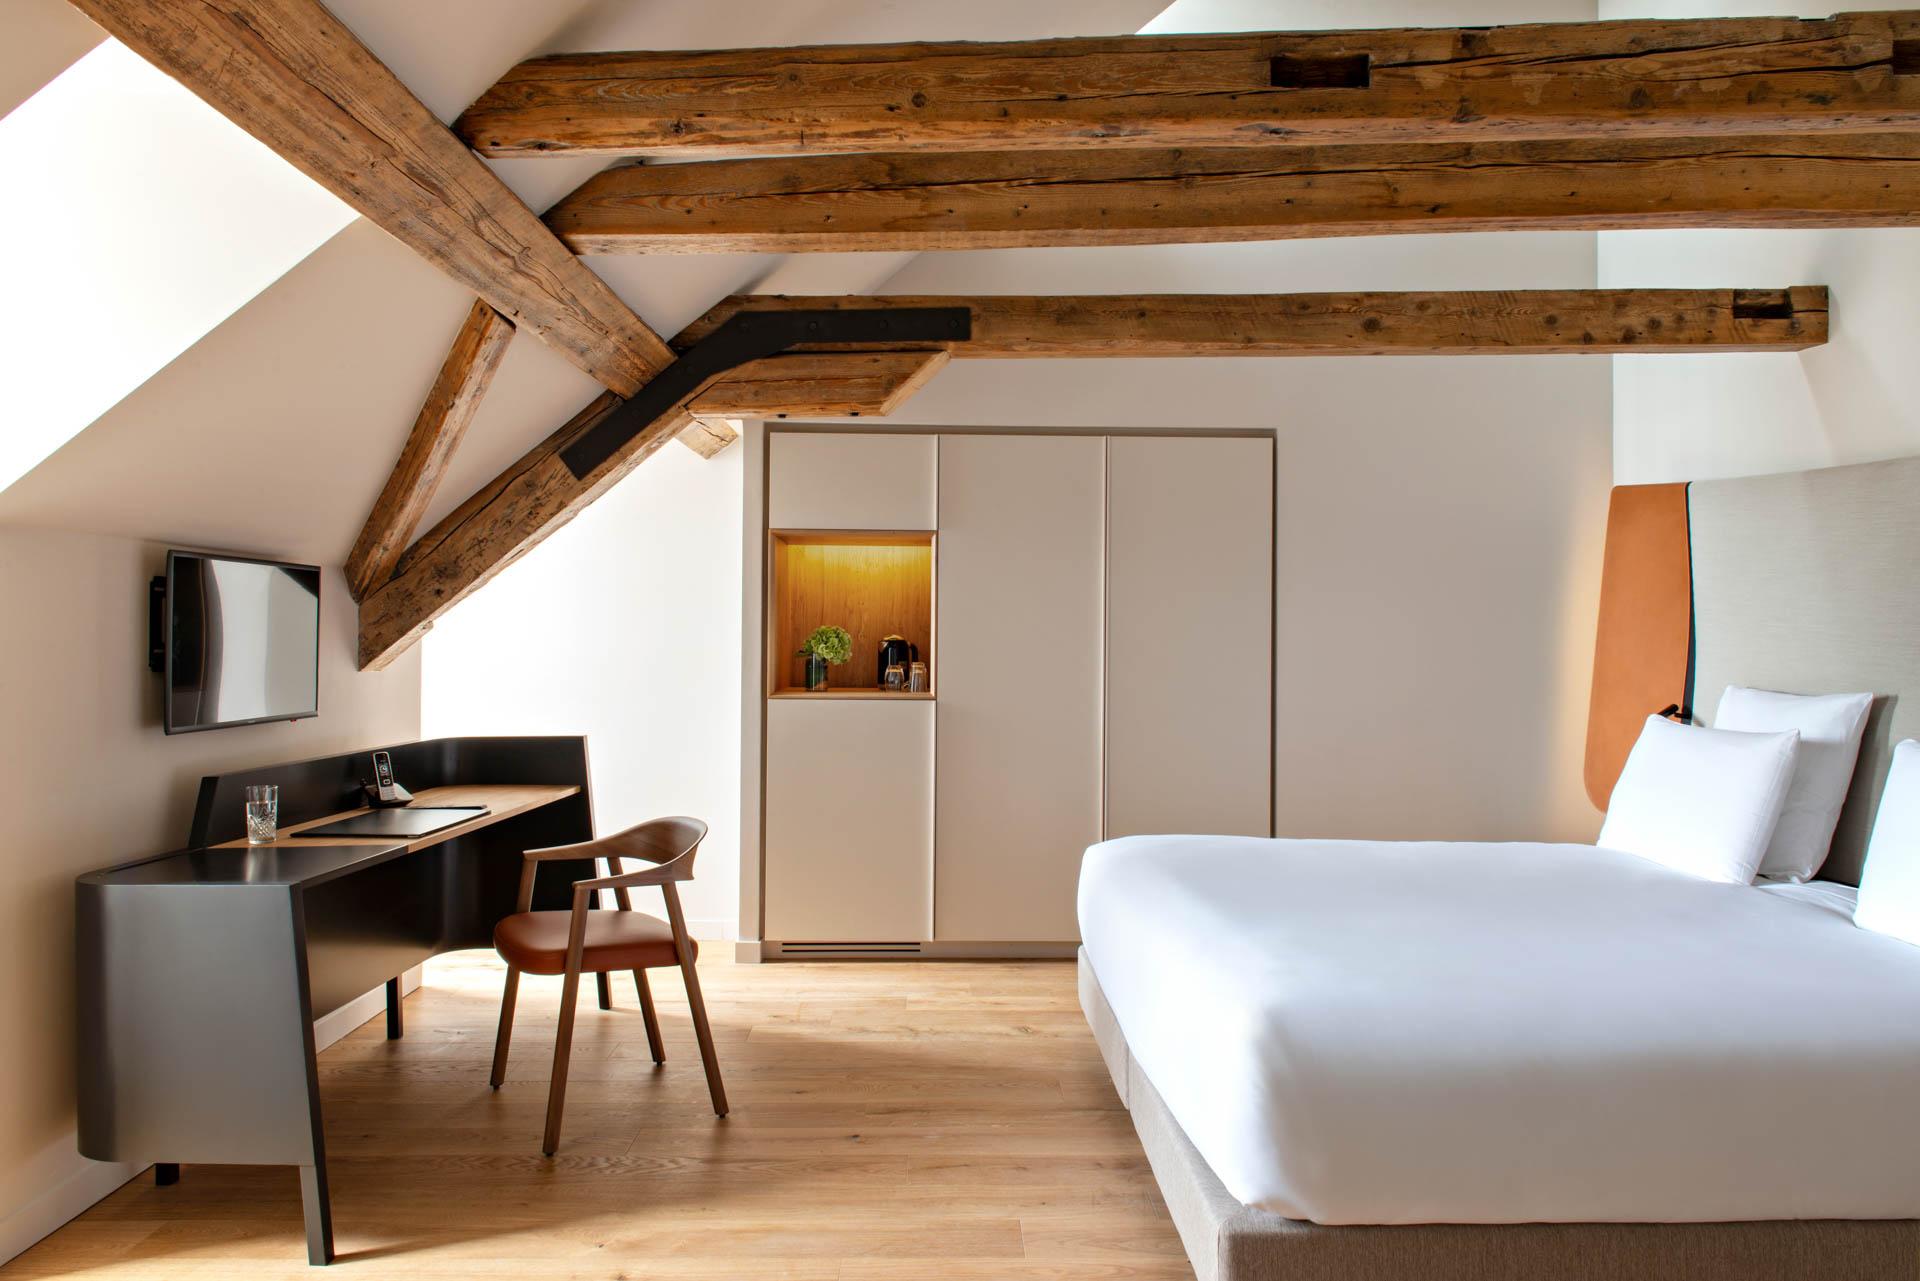 Chambre des Haras de Strasbourg par Jouin Manku © Nicolas Matheus